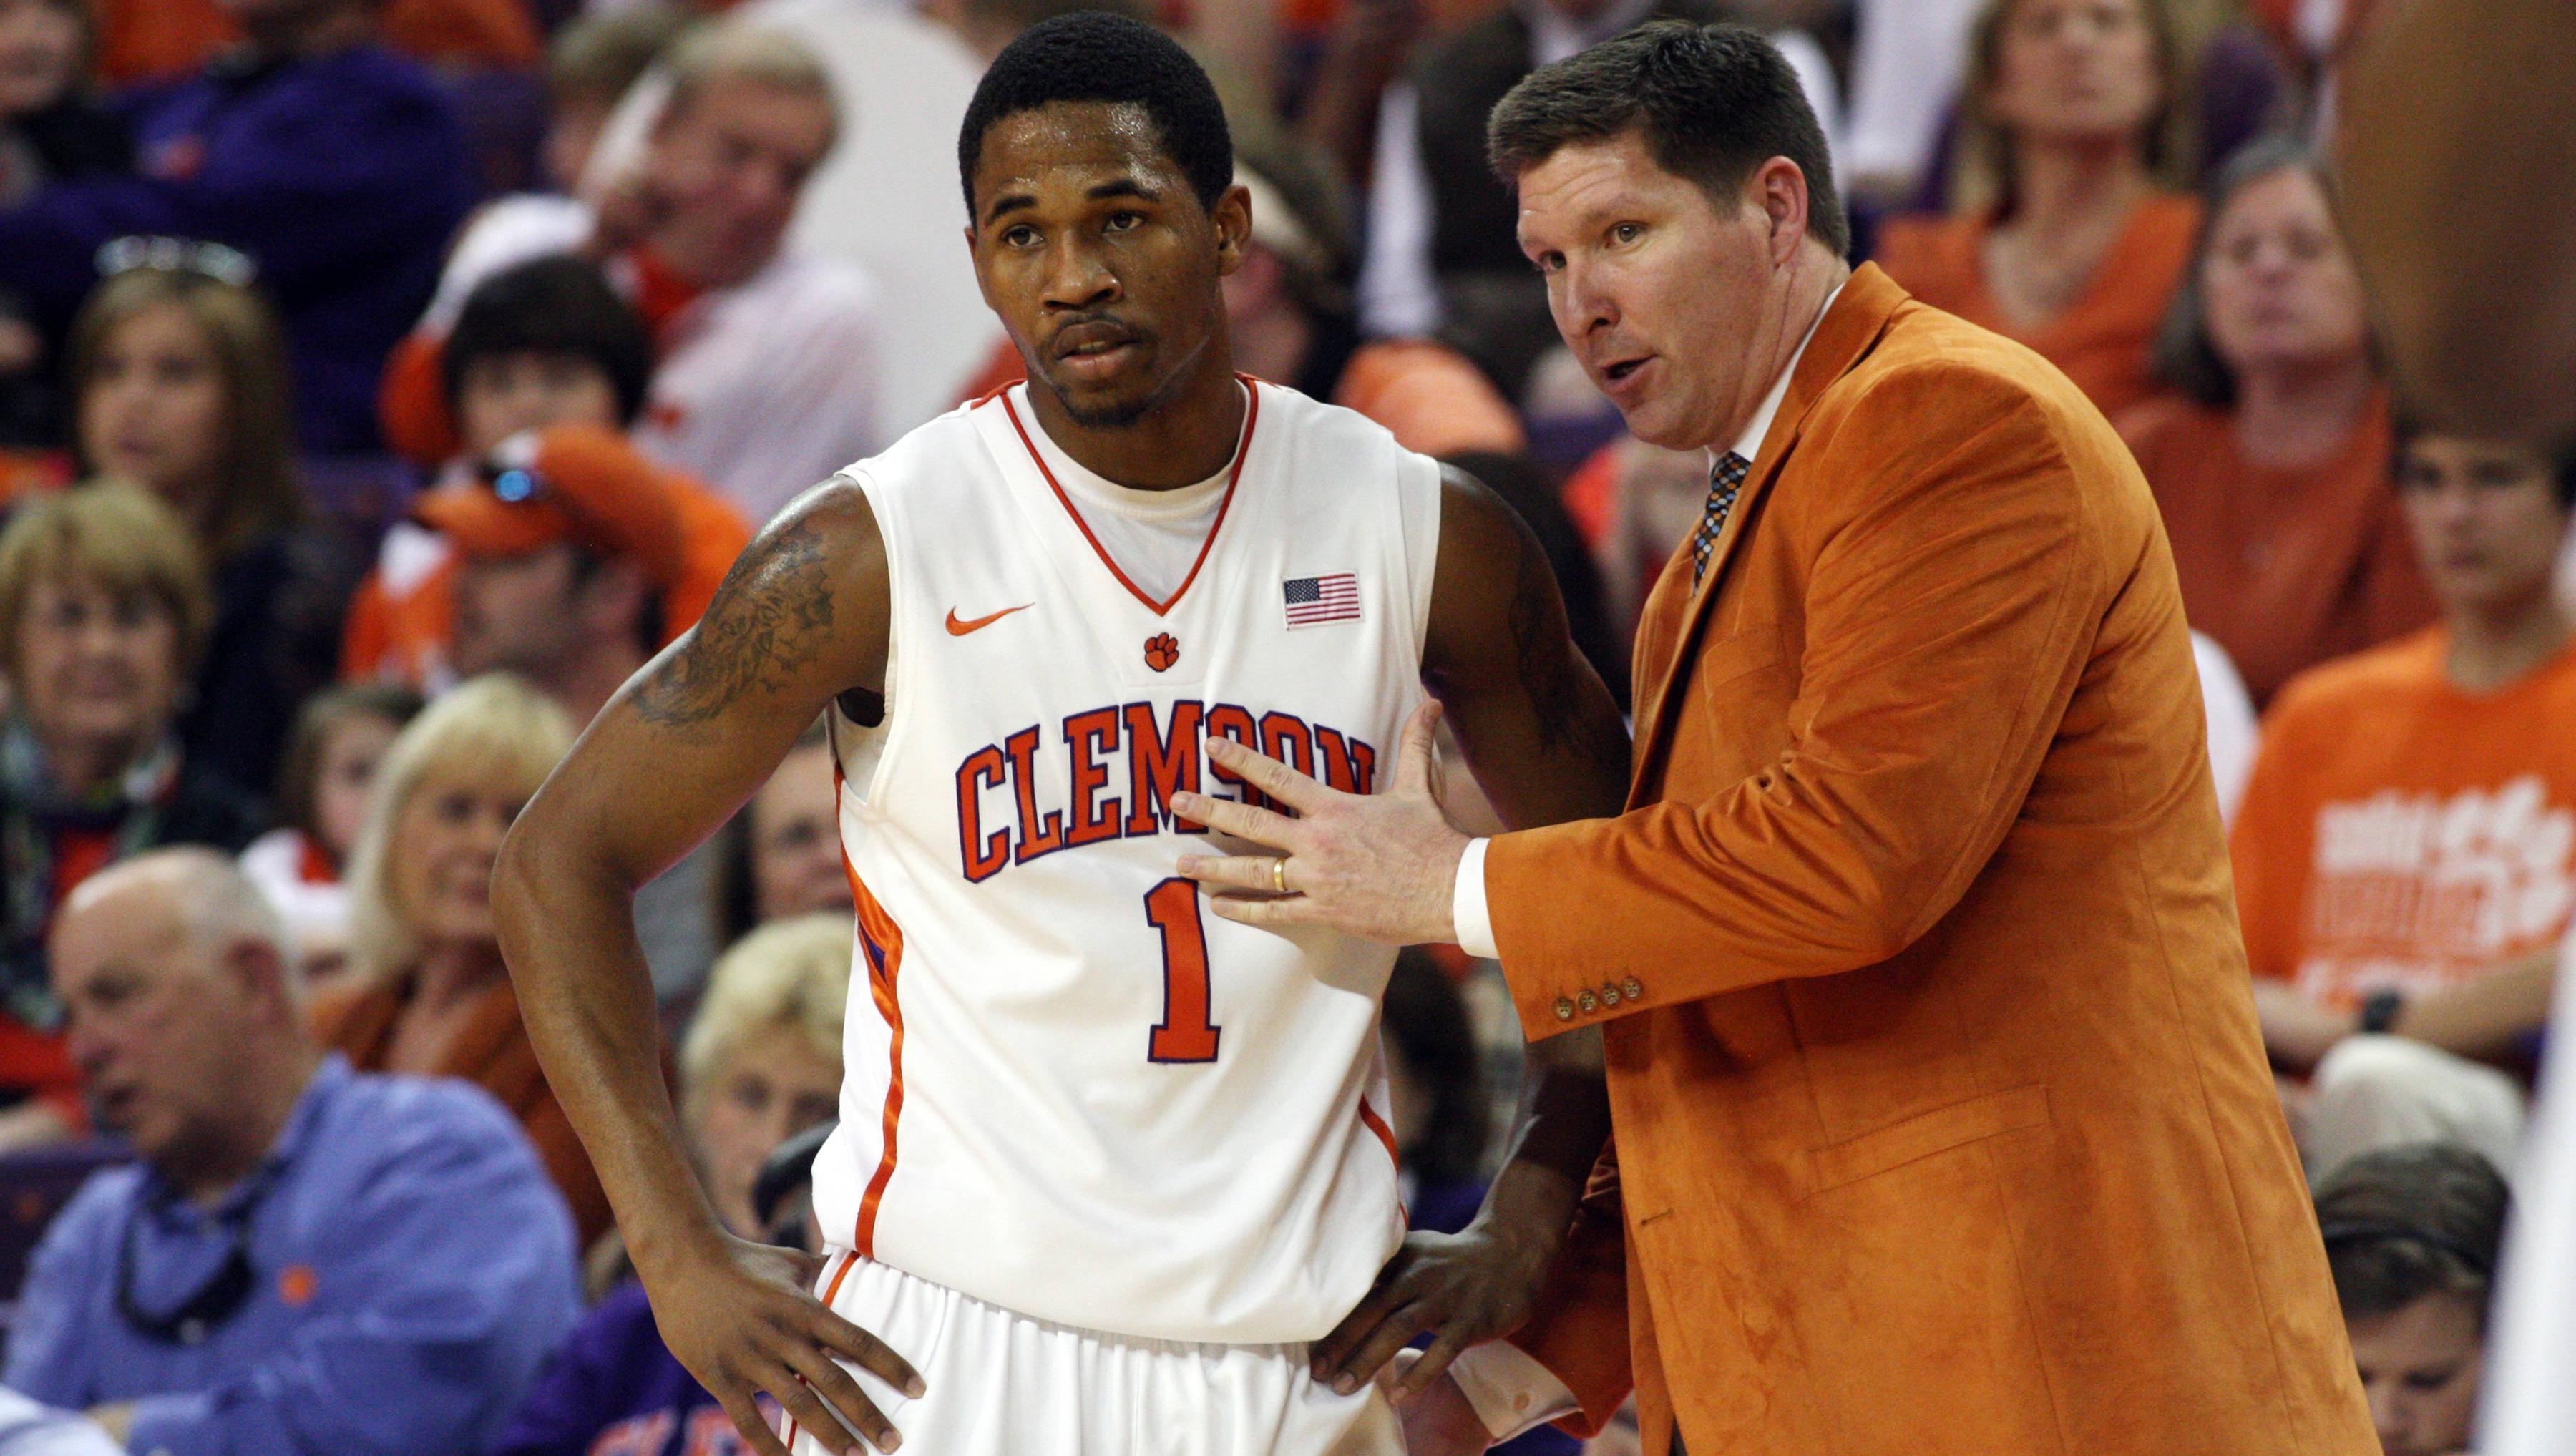 Clemson Eighth in ACC Coaches Preseason Men's Basketball Poll